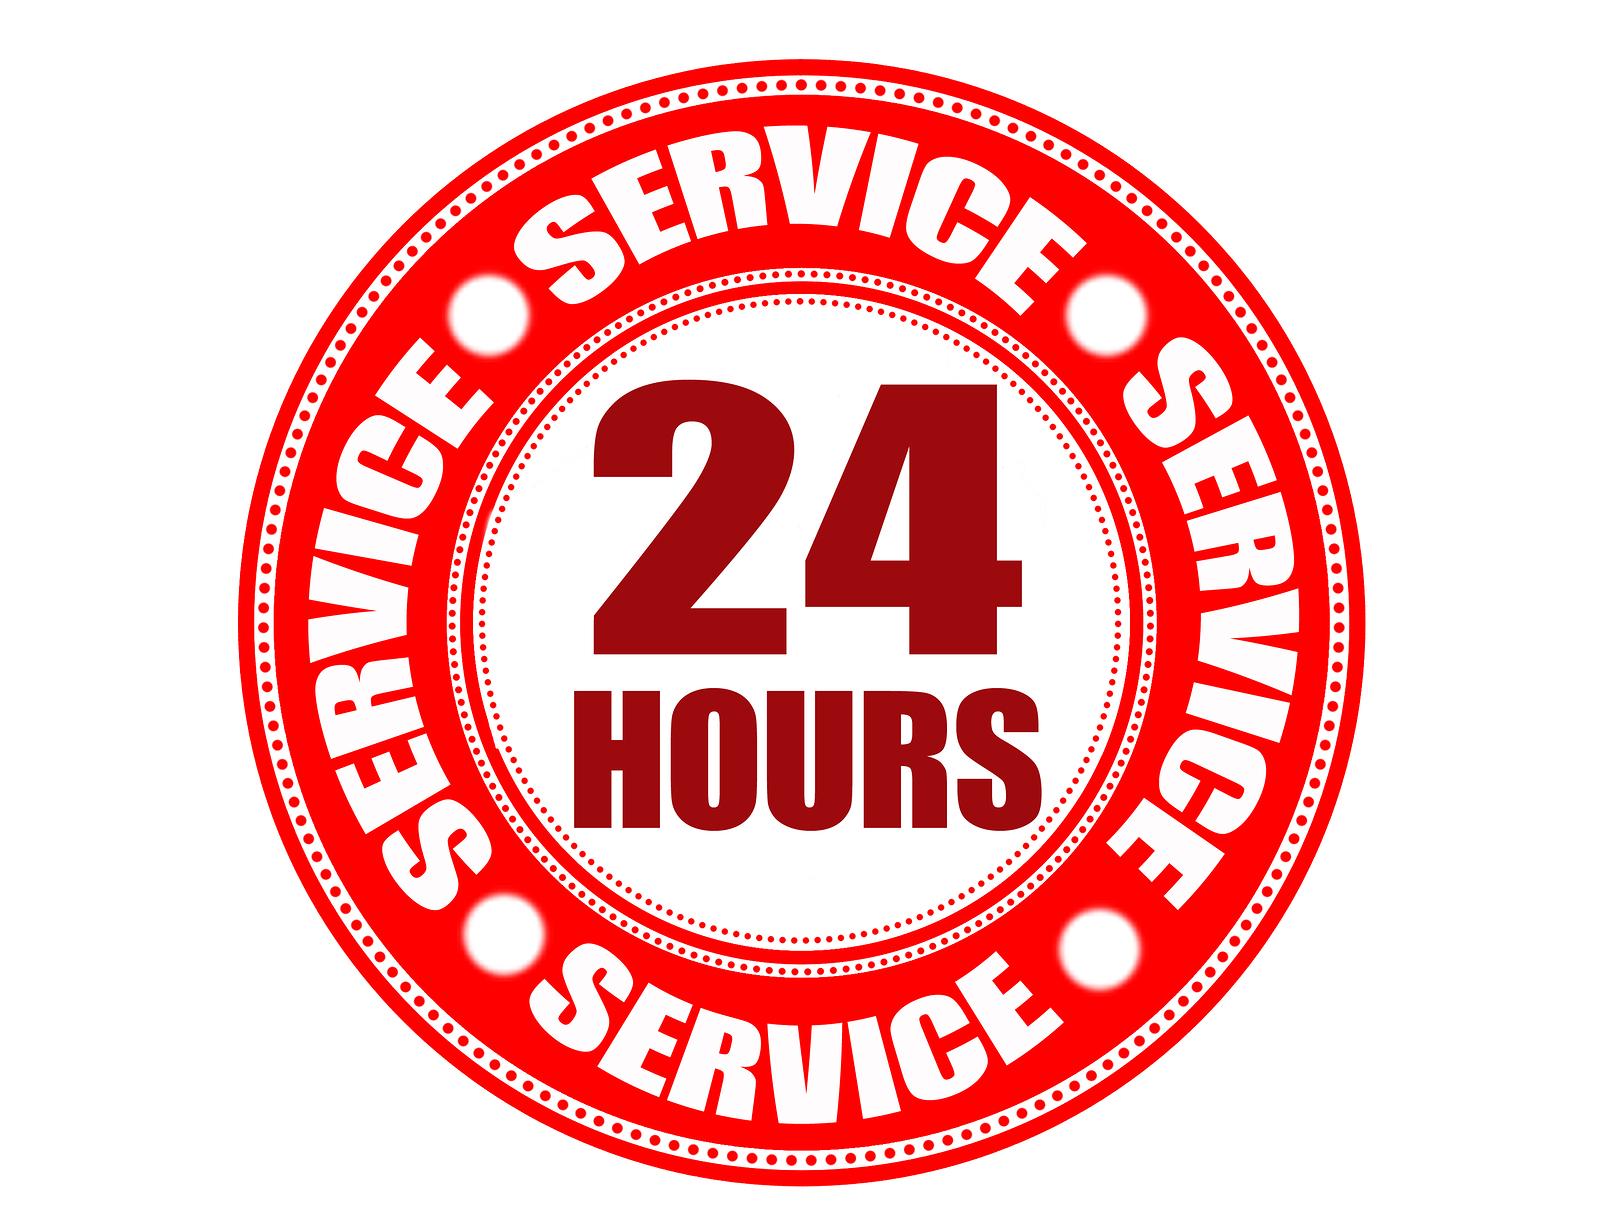 bigstock-Label-Hour-Service-9556910